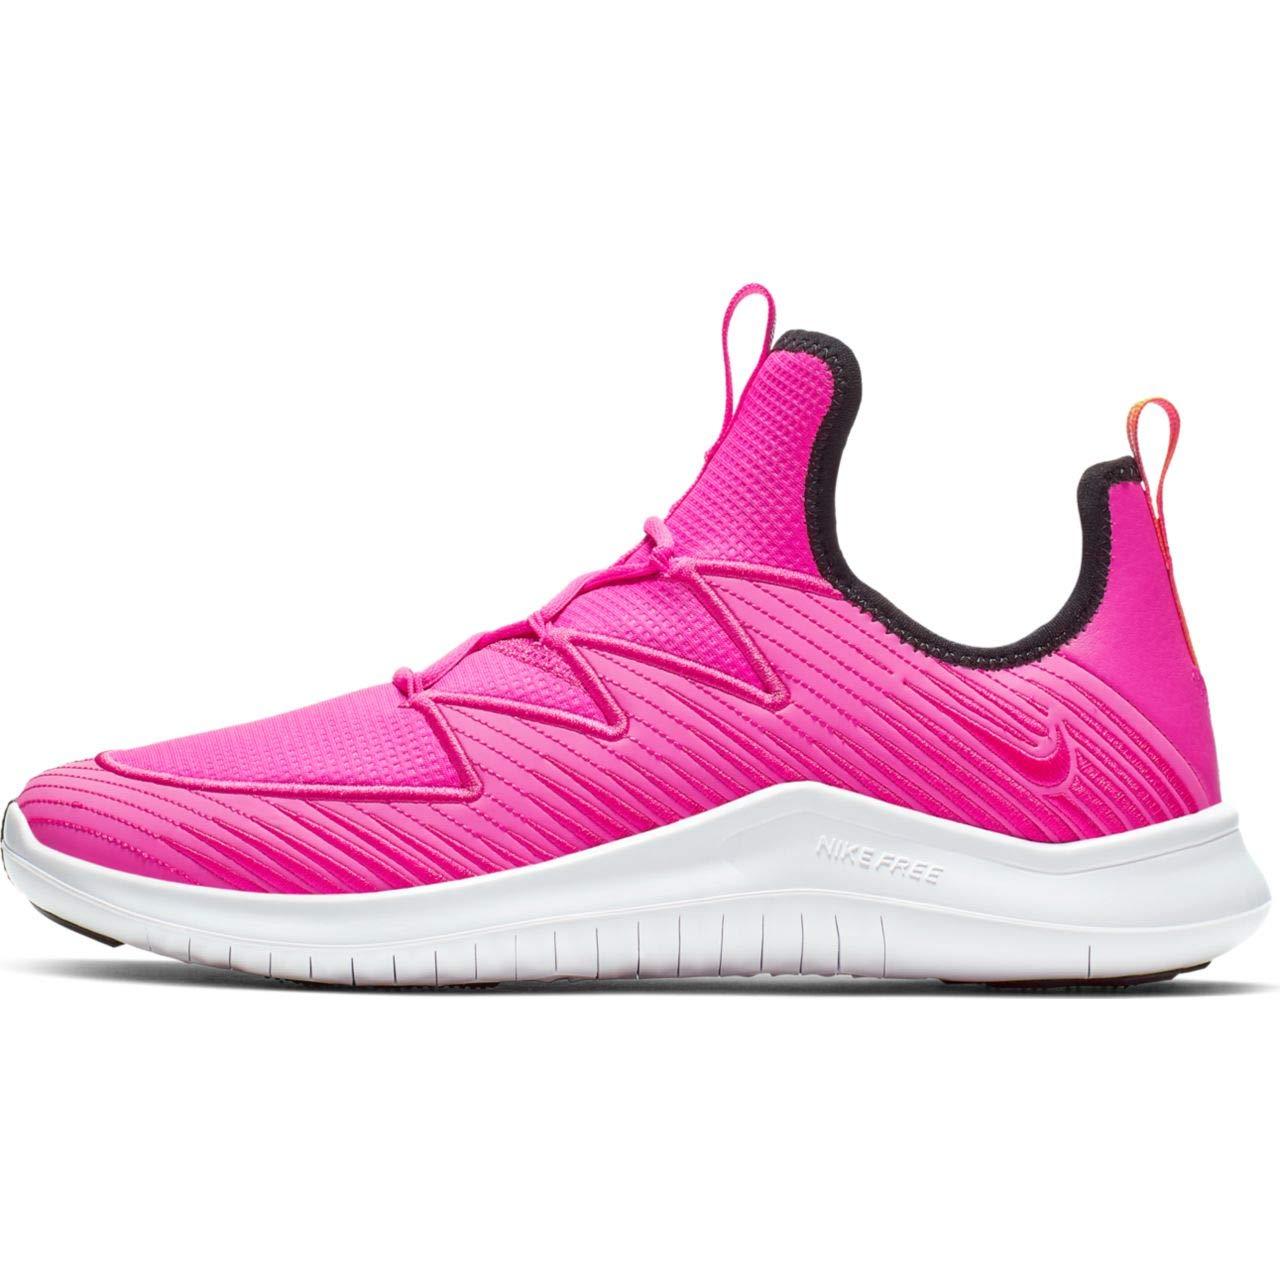 MultiCouleure (Laser Fuchsia Deadly rose blanc noir 000) Nike WMNS Libre TR Ultra, Chaussures de Fitness Femme